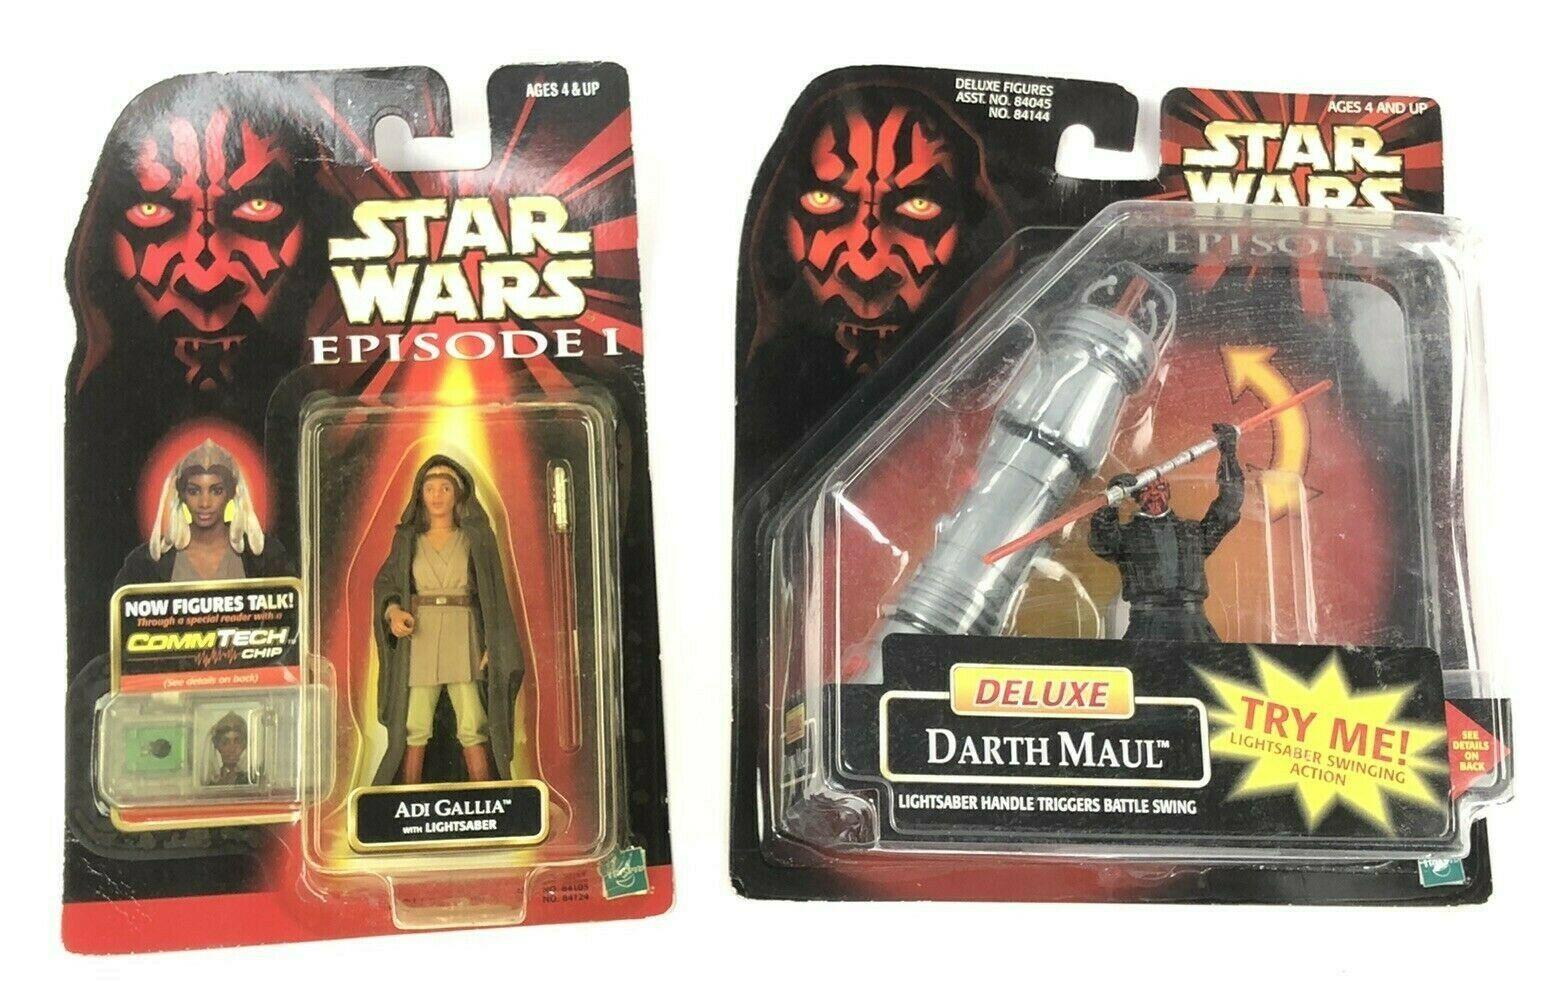 Hasbro Star Wars Episode 1 Darth Maul & Adi Gallia w/Lightsaber Action Figurines - $21.67